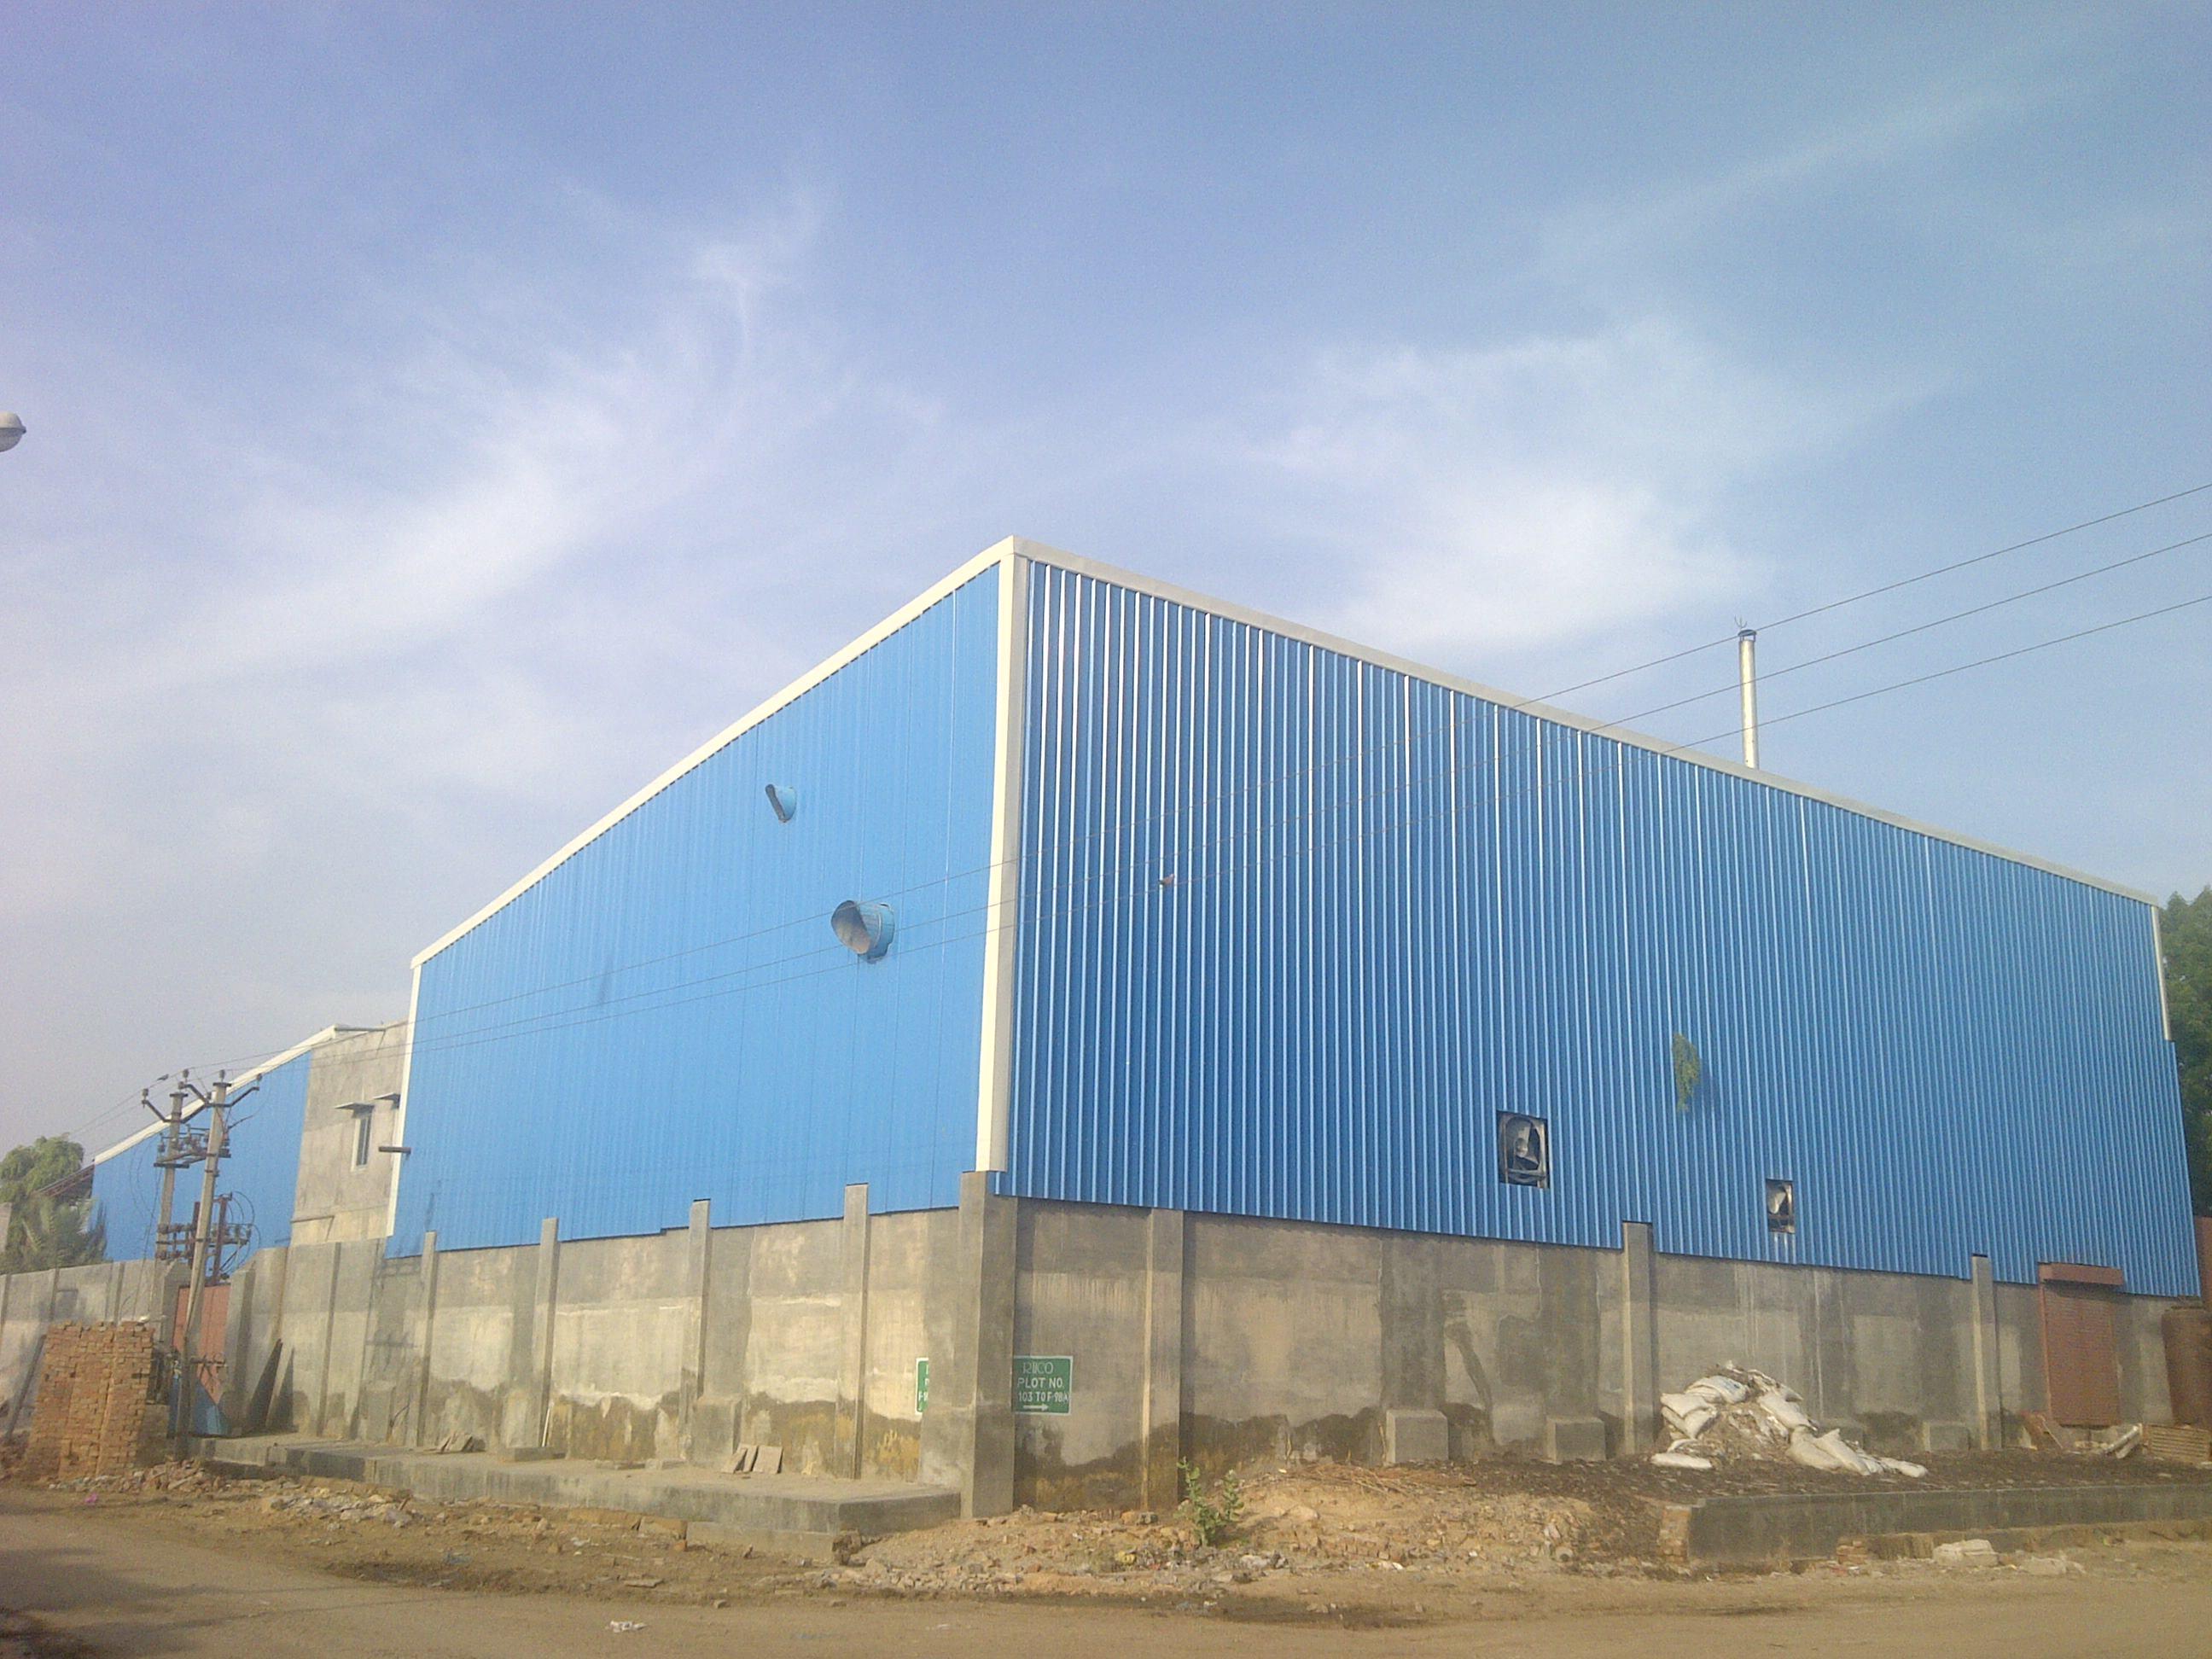 Shri Hari Industries